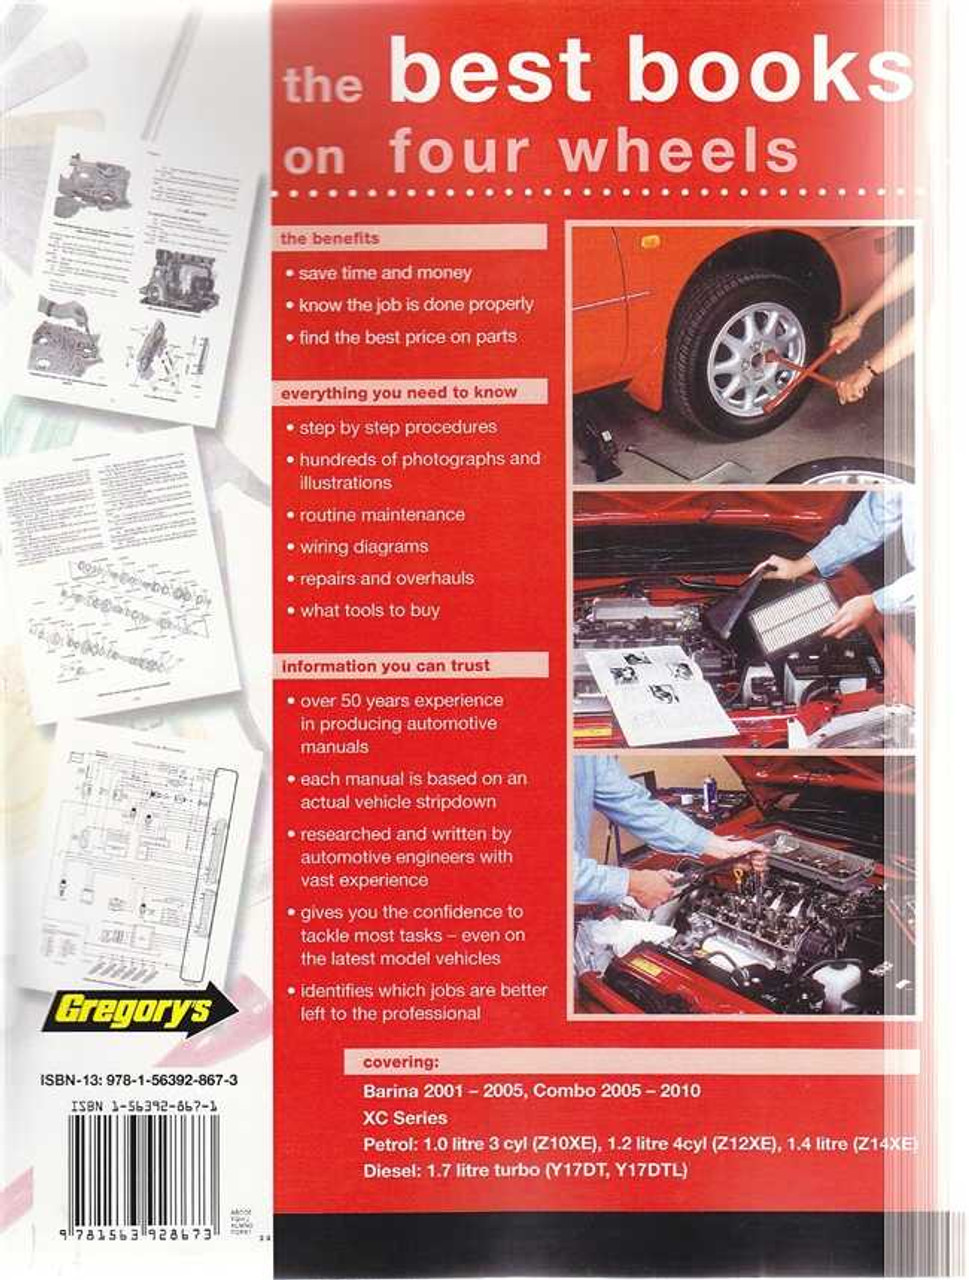 holden barina combo xc series petrol diesel 2001 2010 workshop rh automotobookshop com au Opel Automobiles Avto Opel